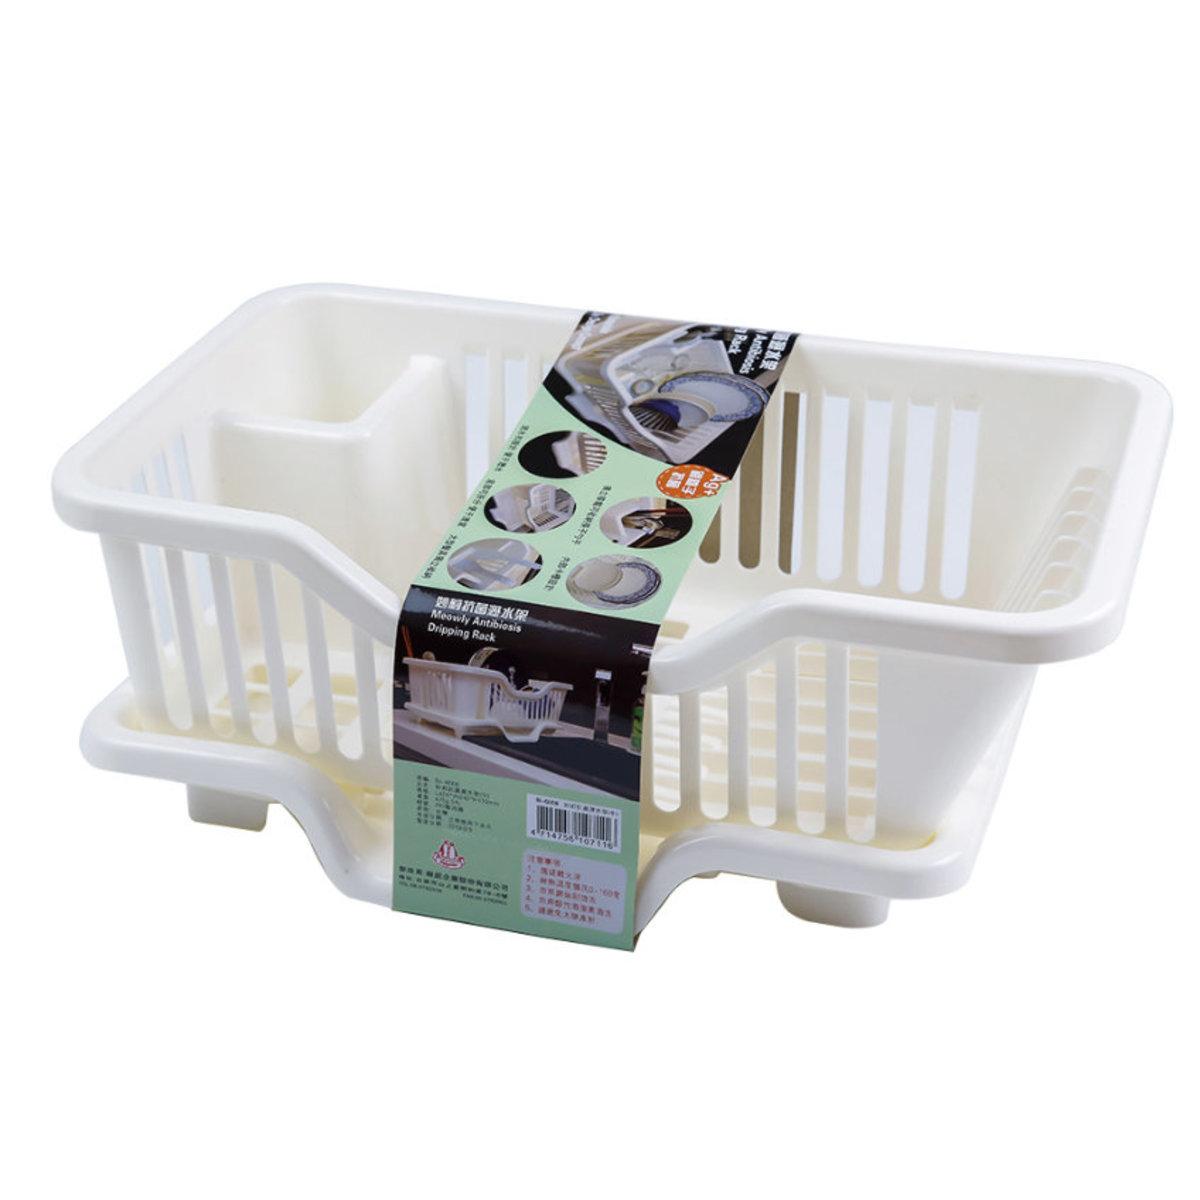 Silver Ion Addition Antibacterial Drain Tableware Bowl Basket Rack 240x425x170mm